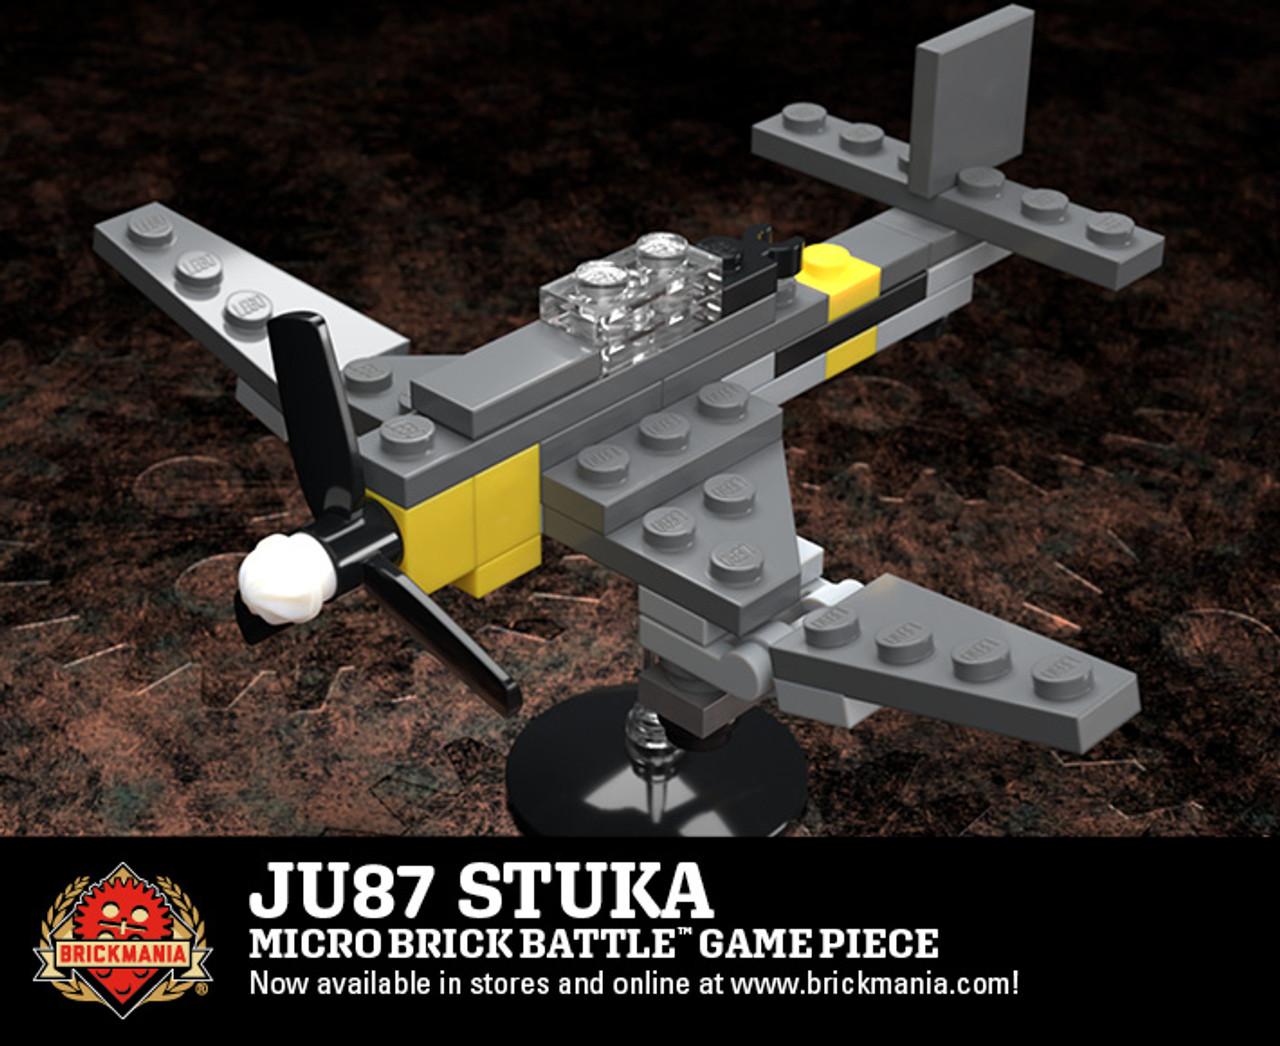 Ju 87 Stuka - Micro Brick Battle Game Piece